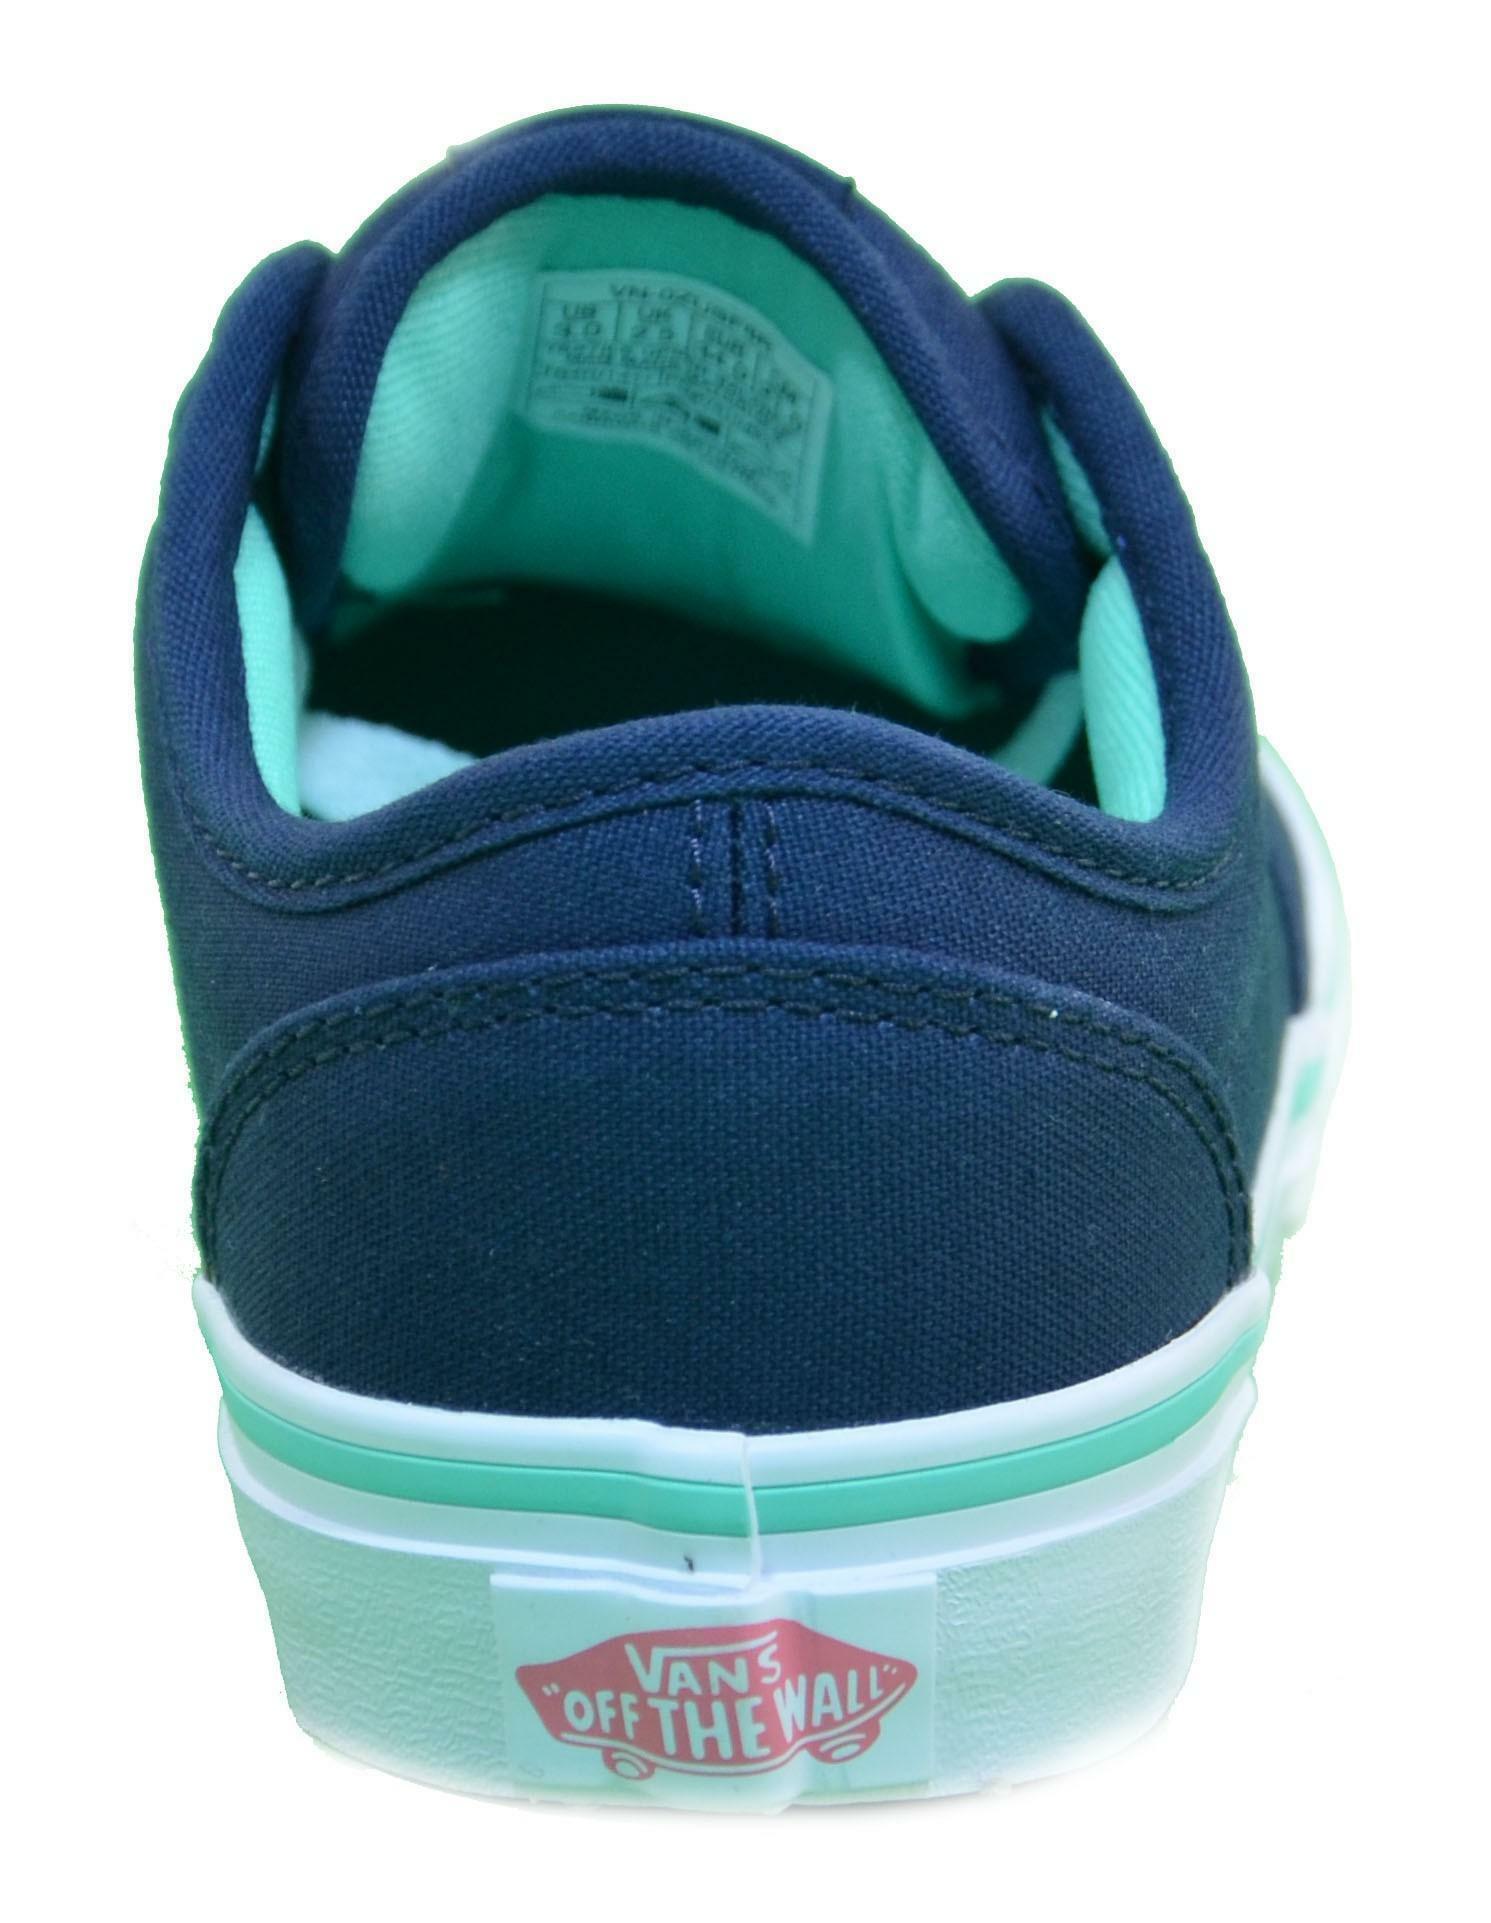 vans vans atwood scarpe bambino blu tela zusf8r